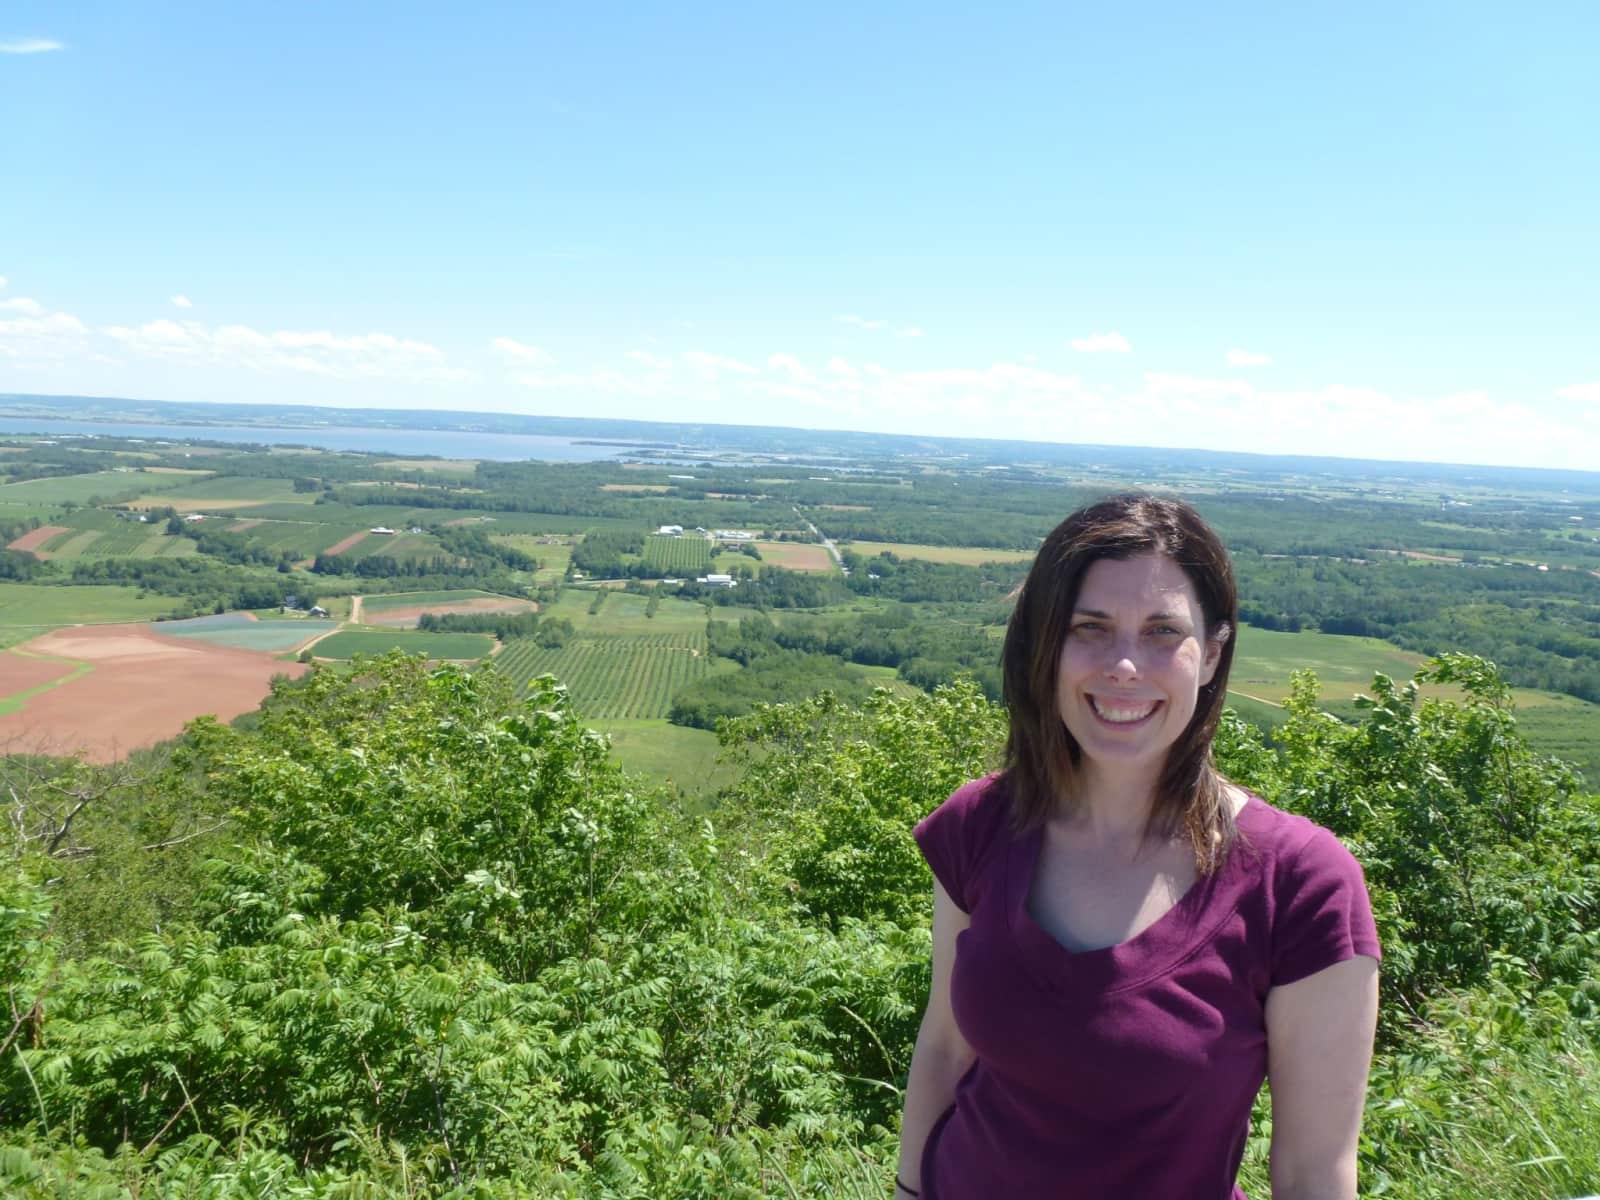 Gwen from Stratford, Ontario, Canada